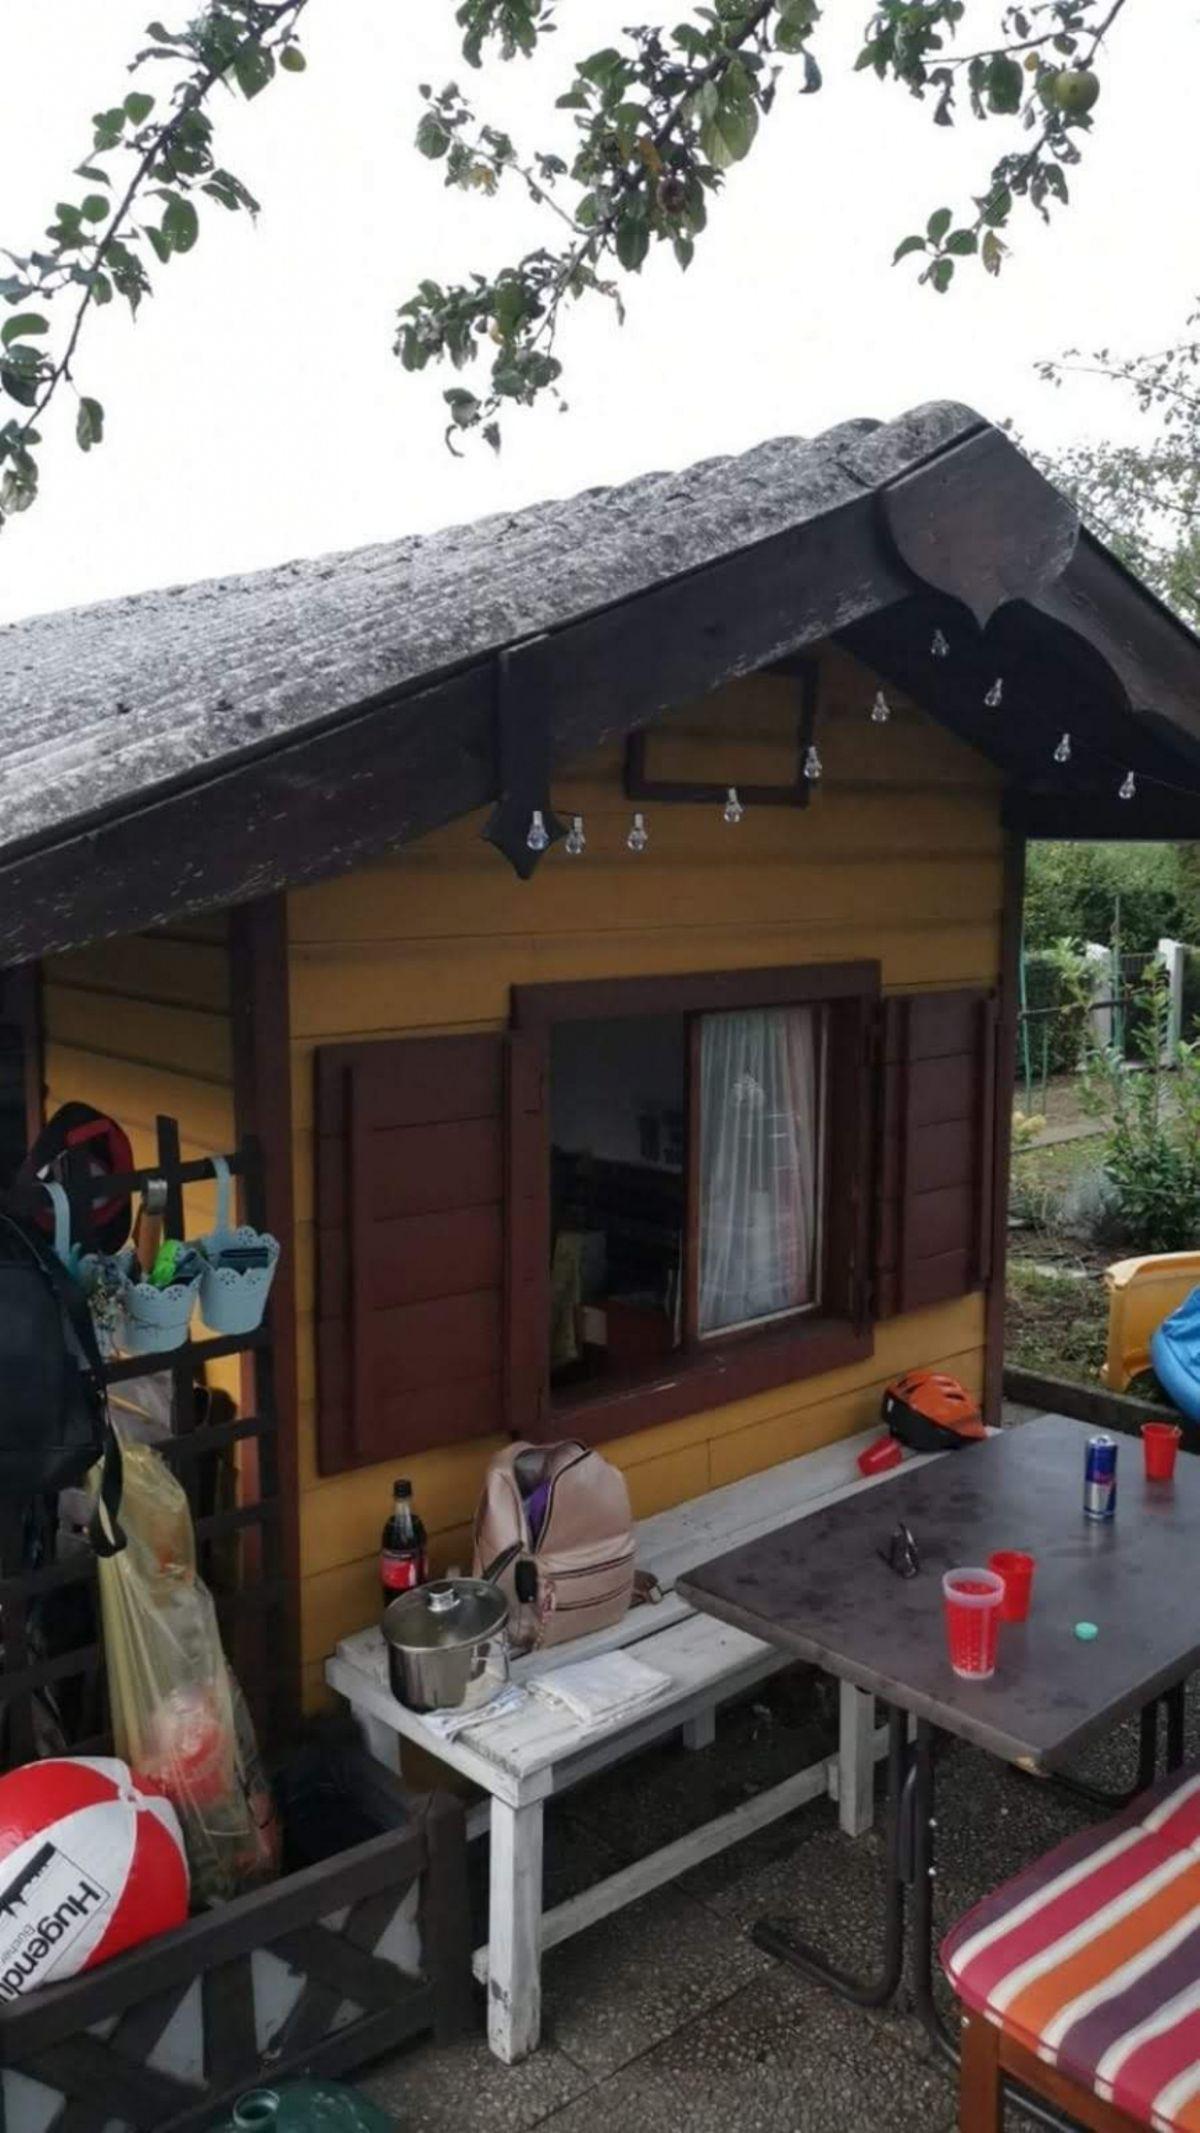 Gartenhaus Zu Verschenken